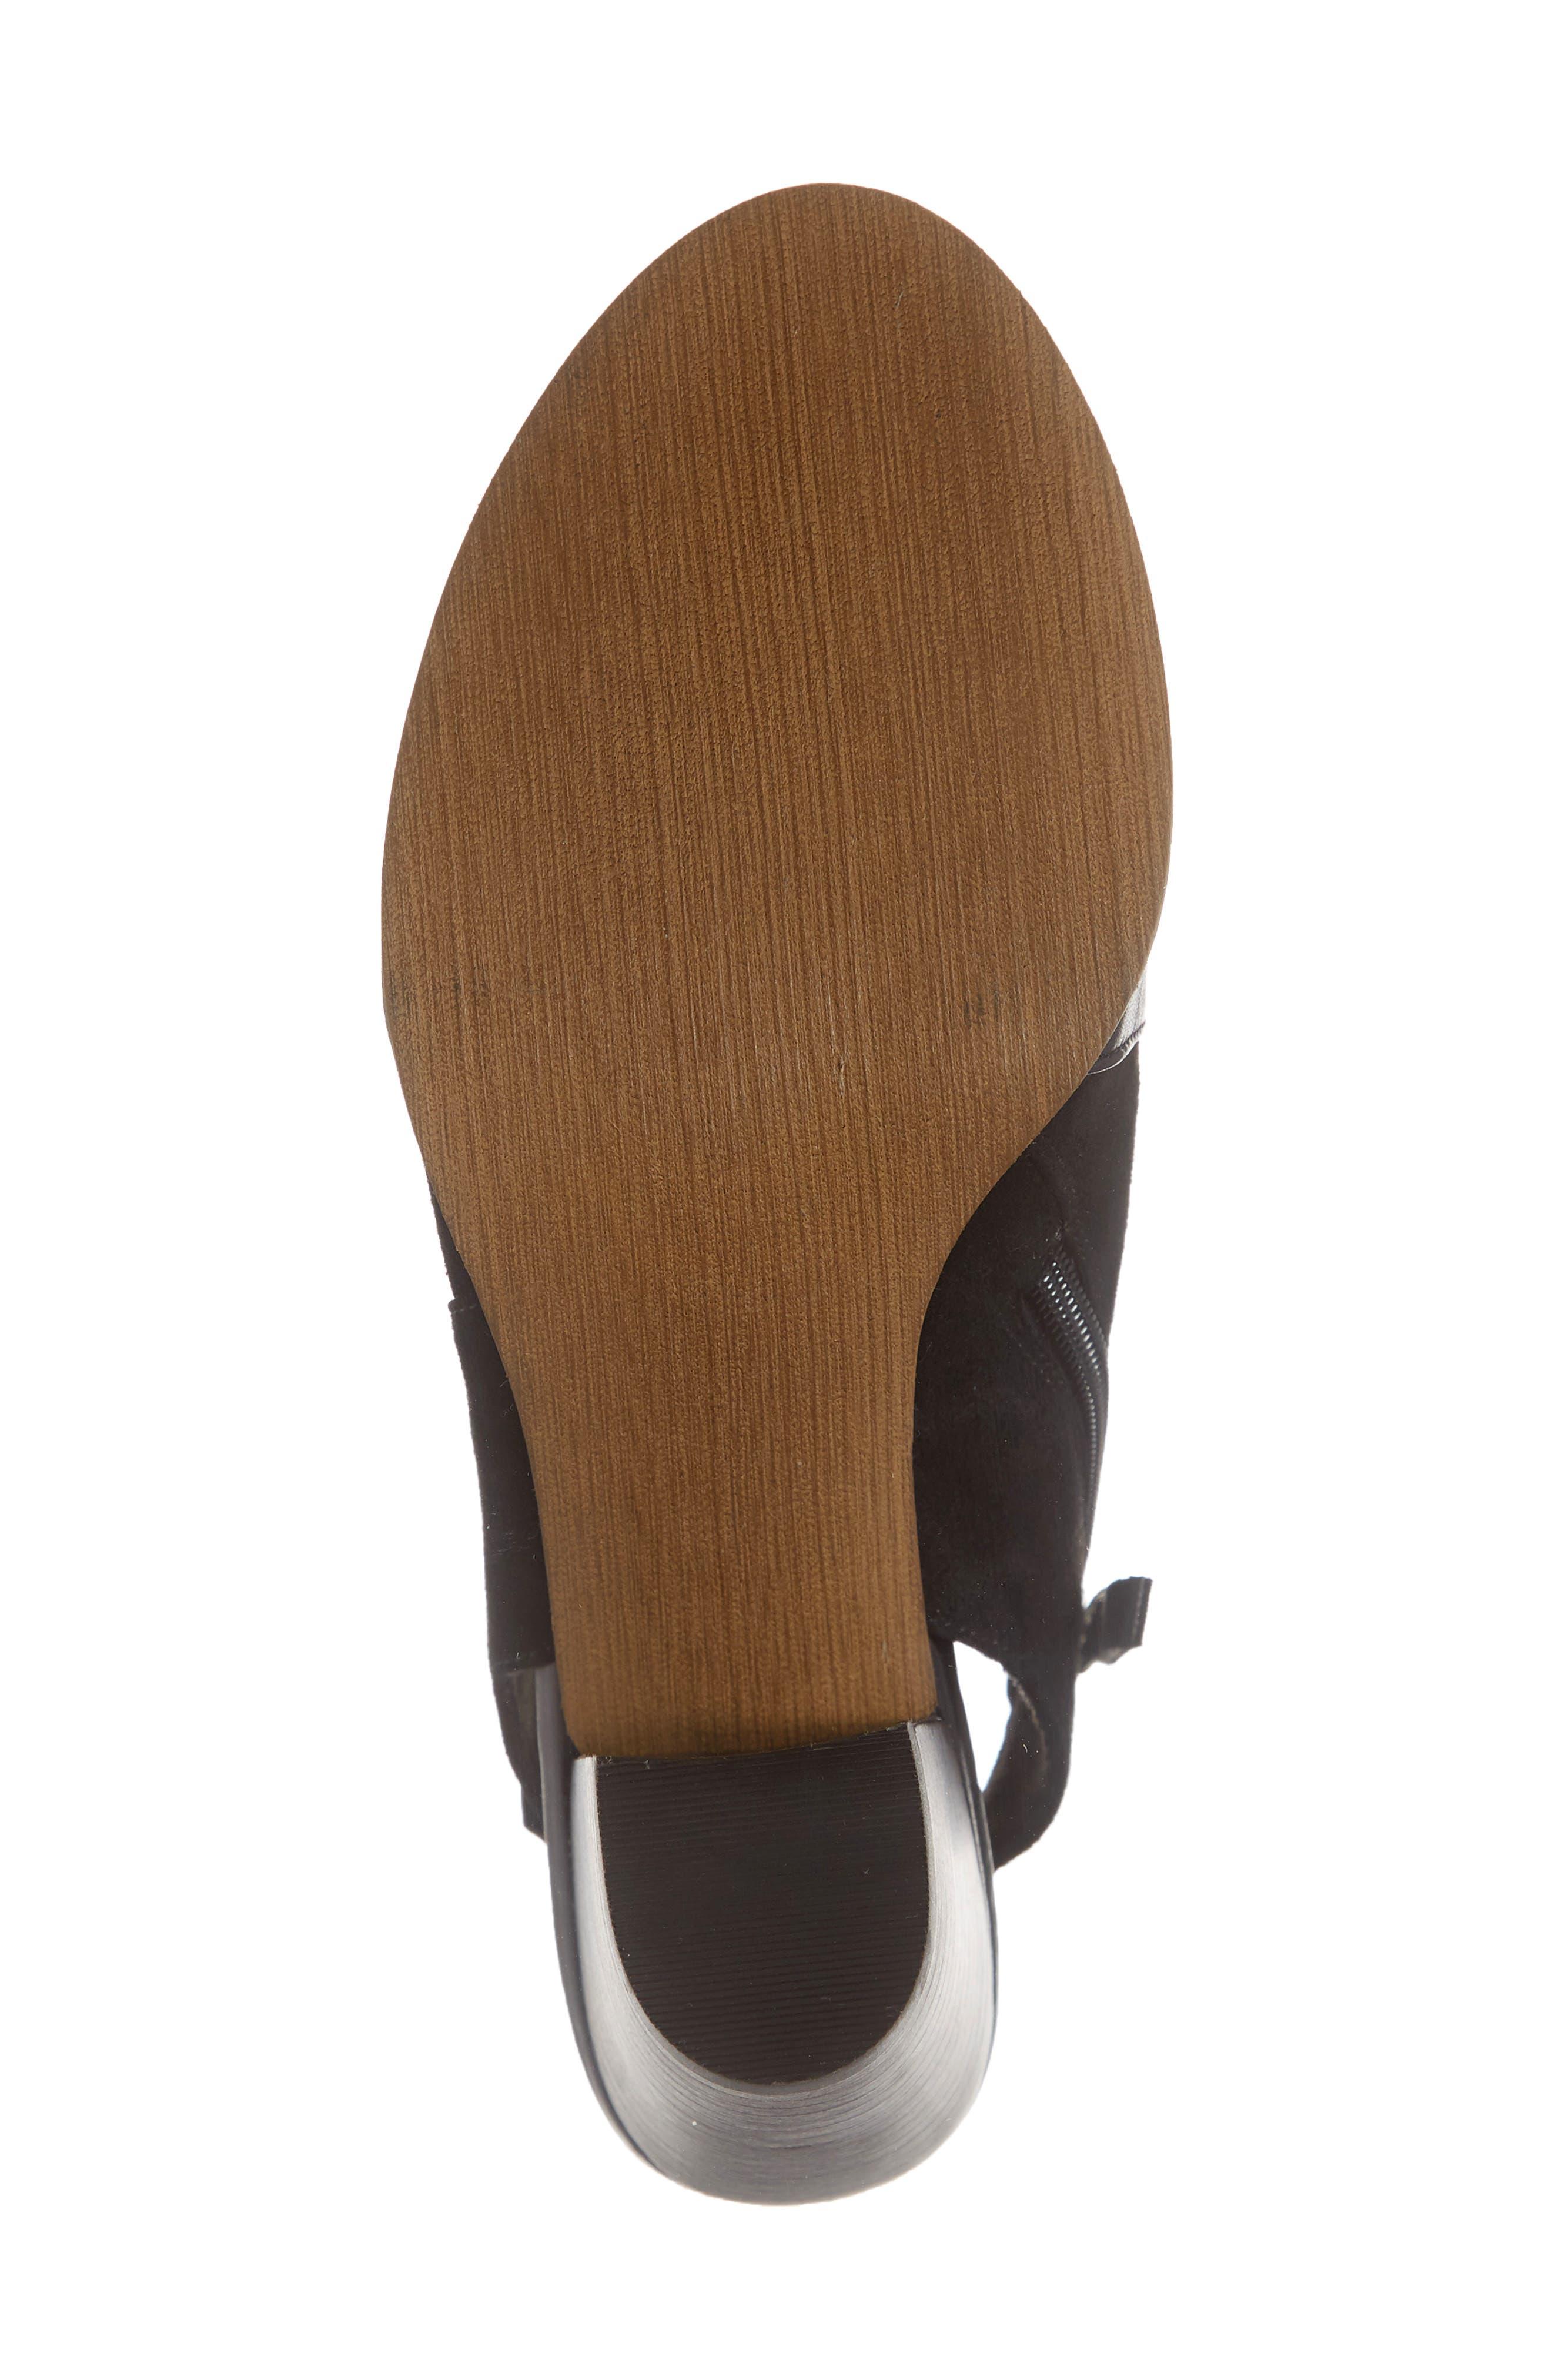 BELLA VITA, Kellan Mixed Finish Sandal, Alternate thumbnail 6, color, BLACK LEATHER/ SUEDE